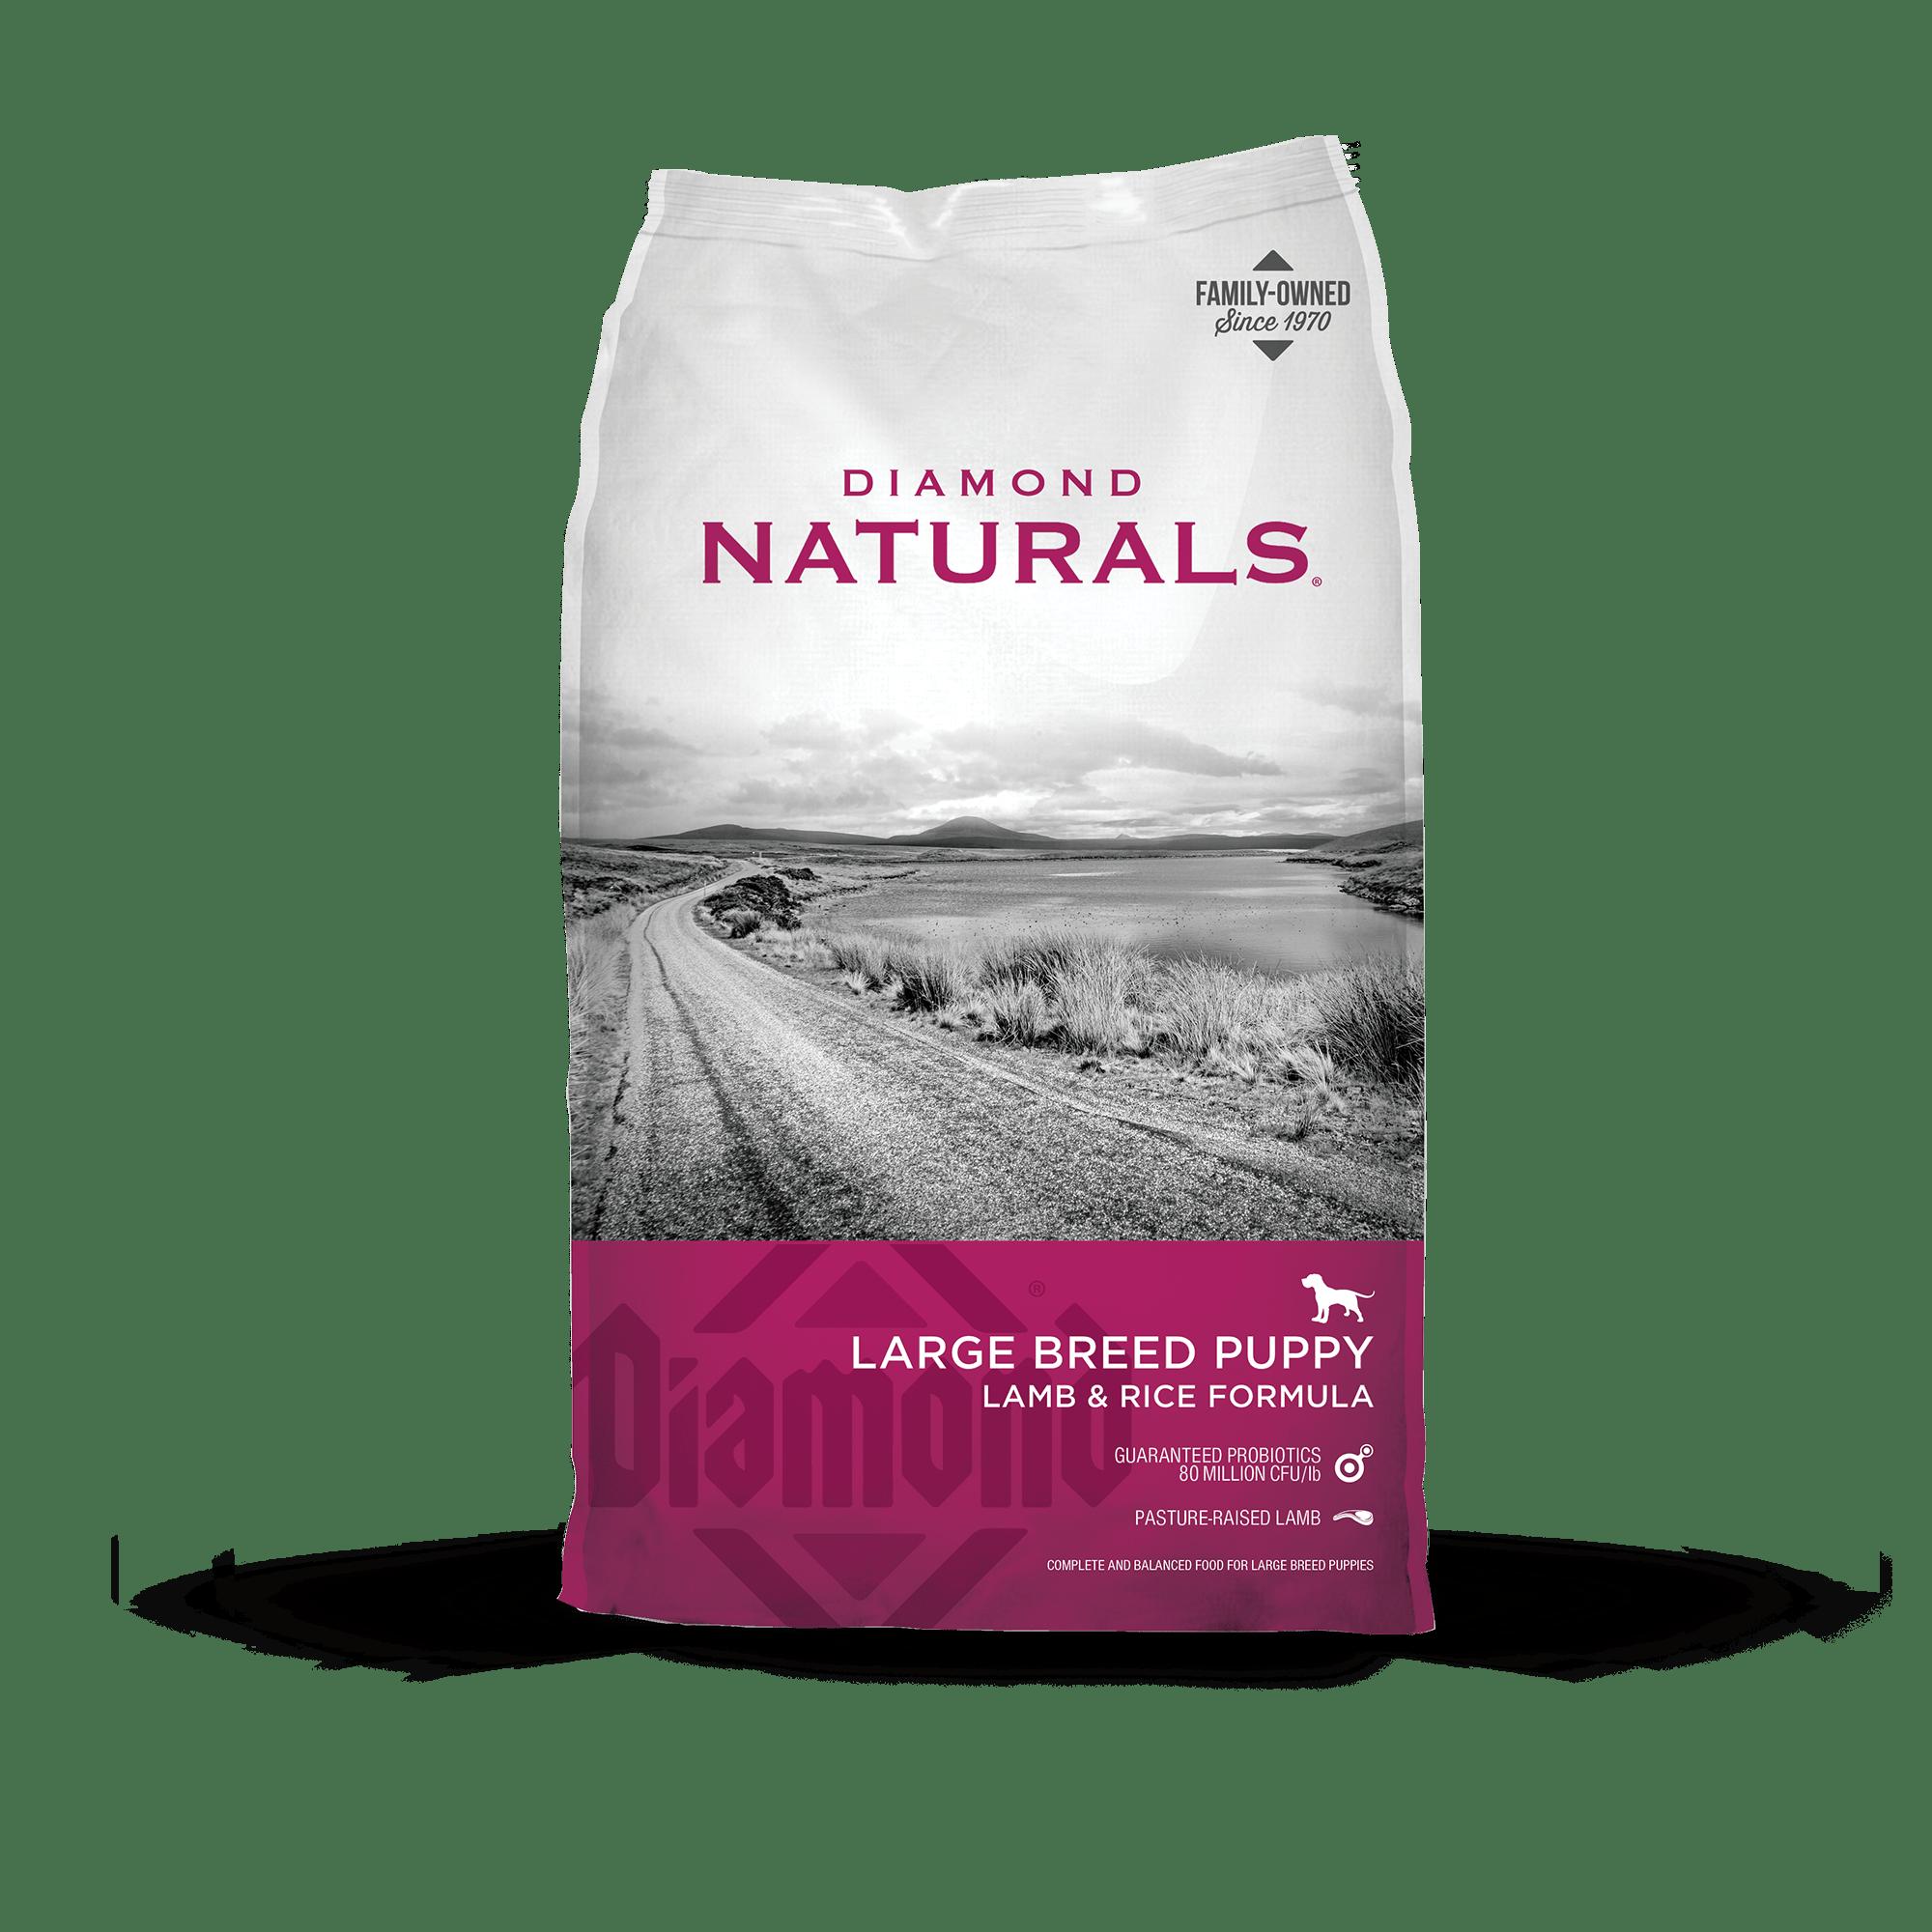 Diamond Diamond Naturals Large Breed Puppy Lamb & Rice Dry Dog Food